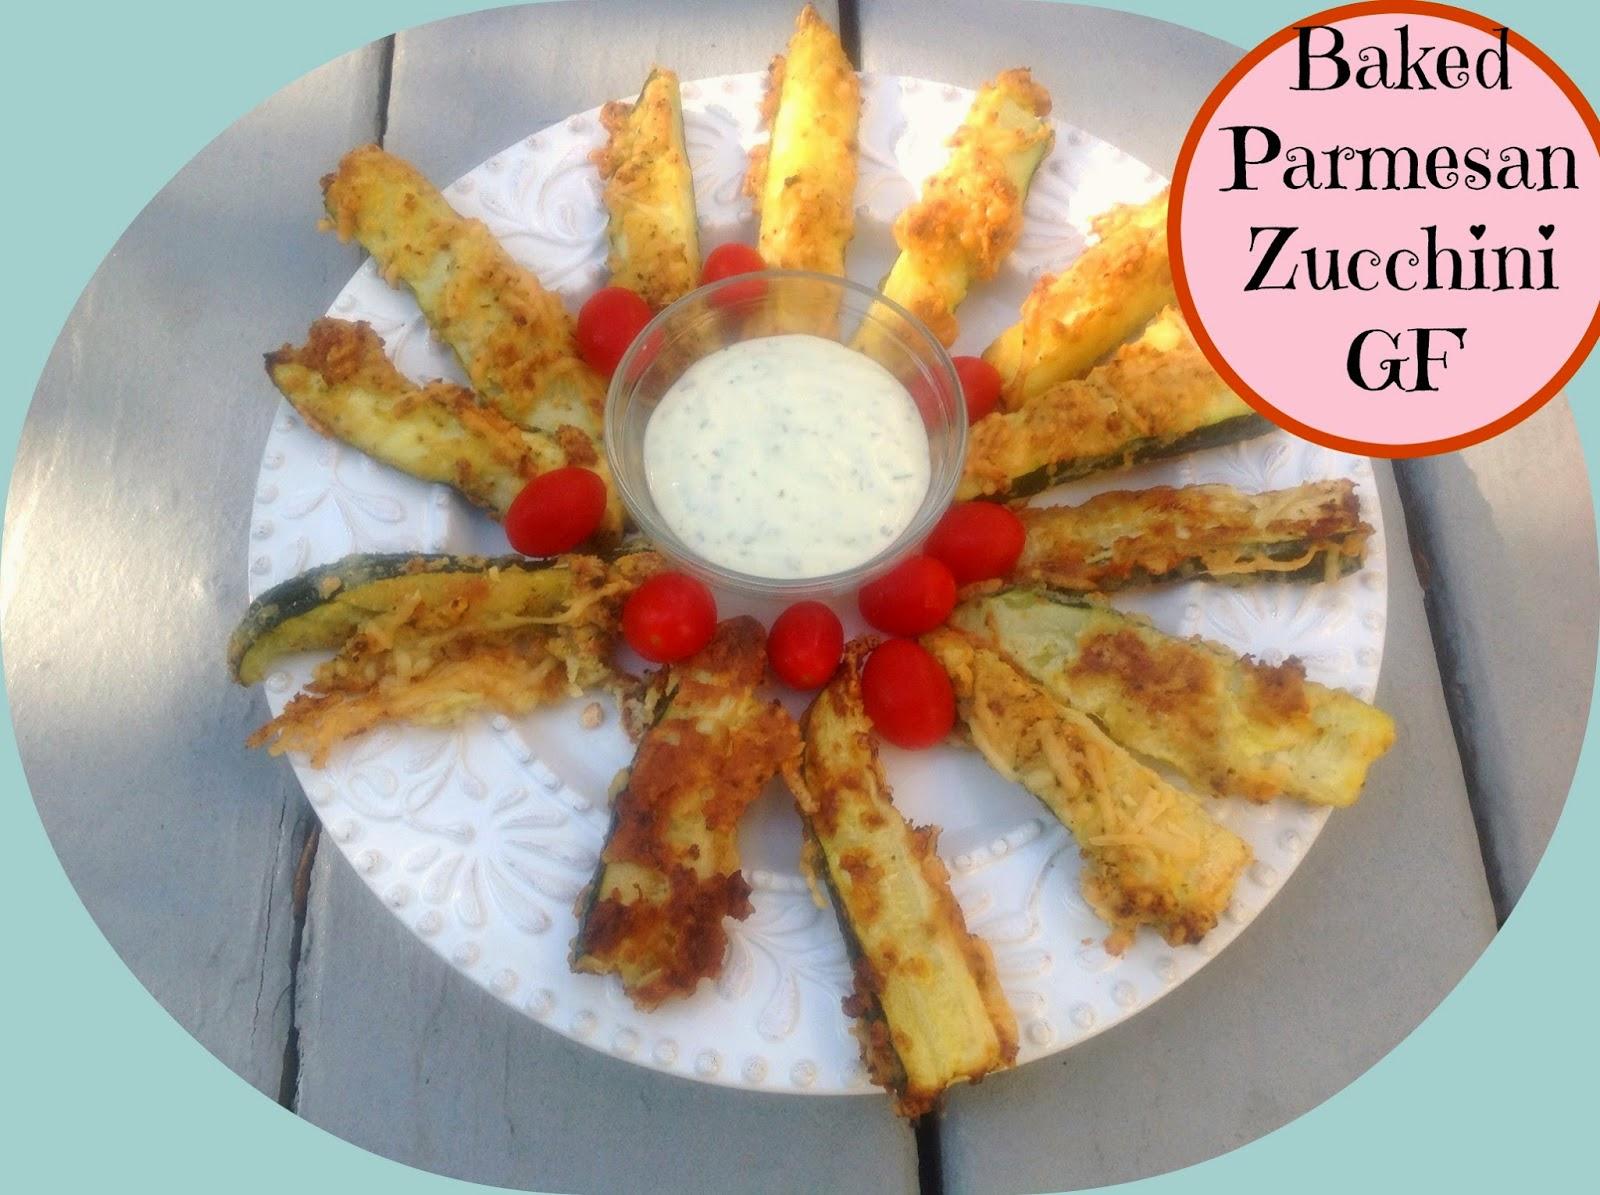 gluten free zucchini cheese stick appetizer